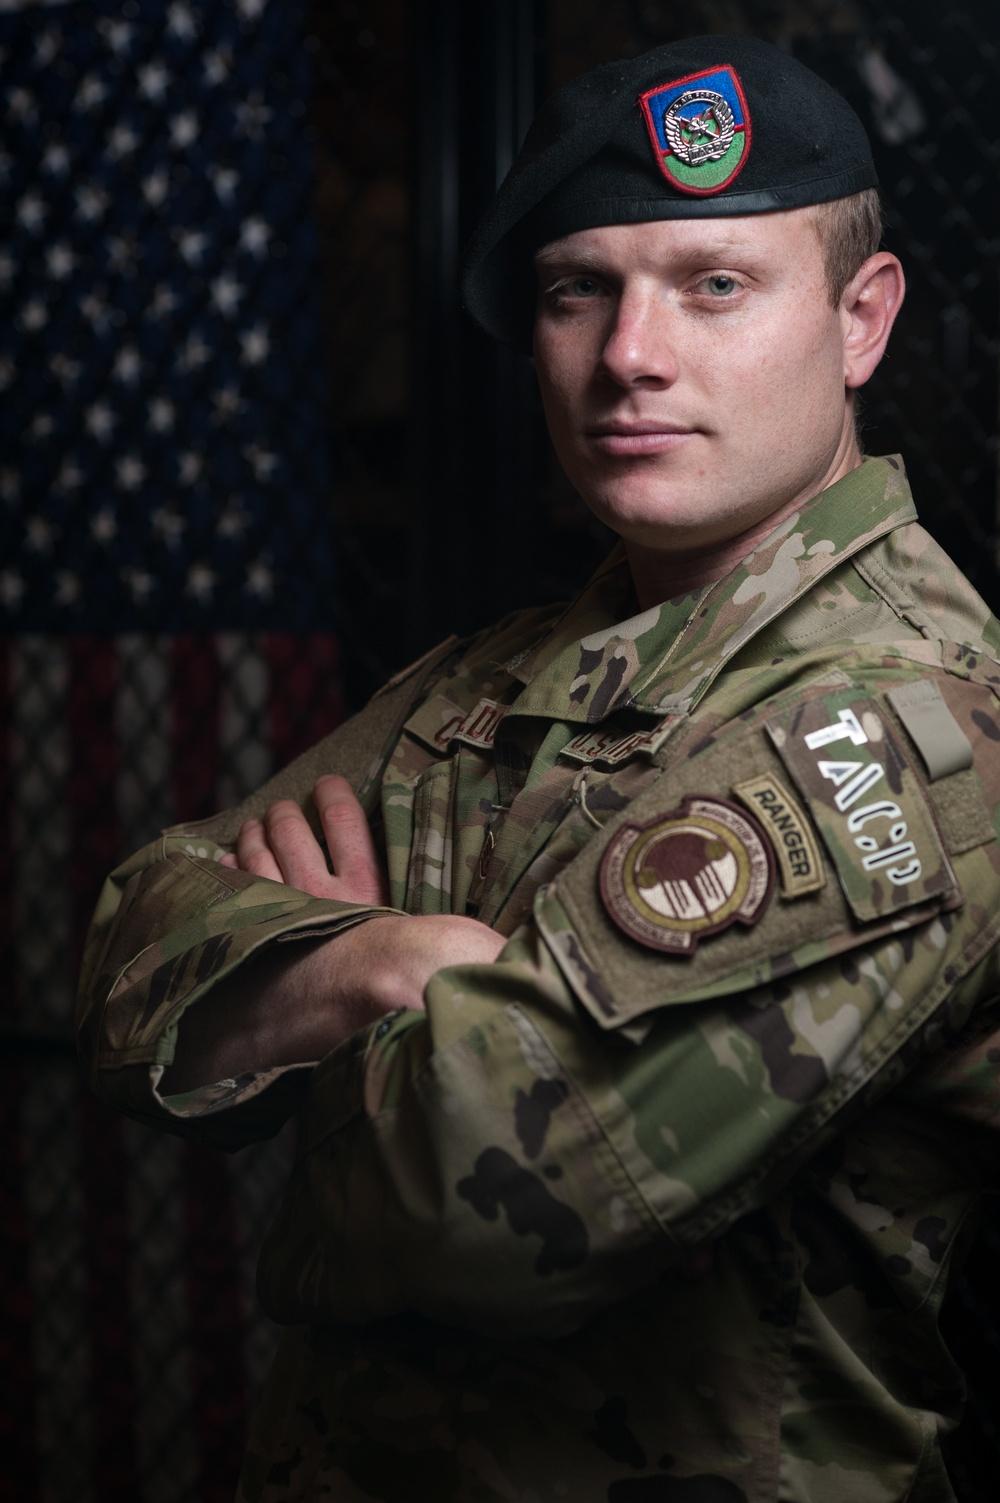 113th ASOS TAC-P graduates Army Ranger School